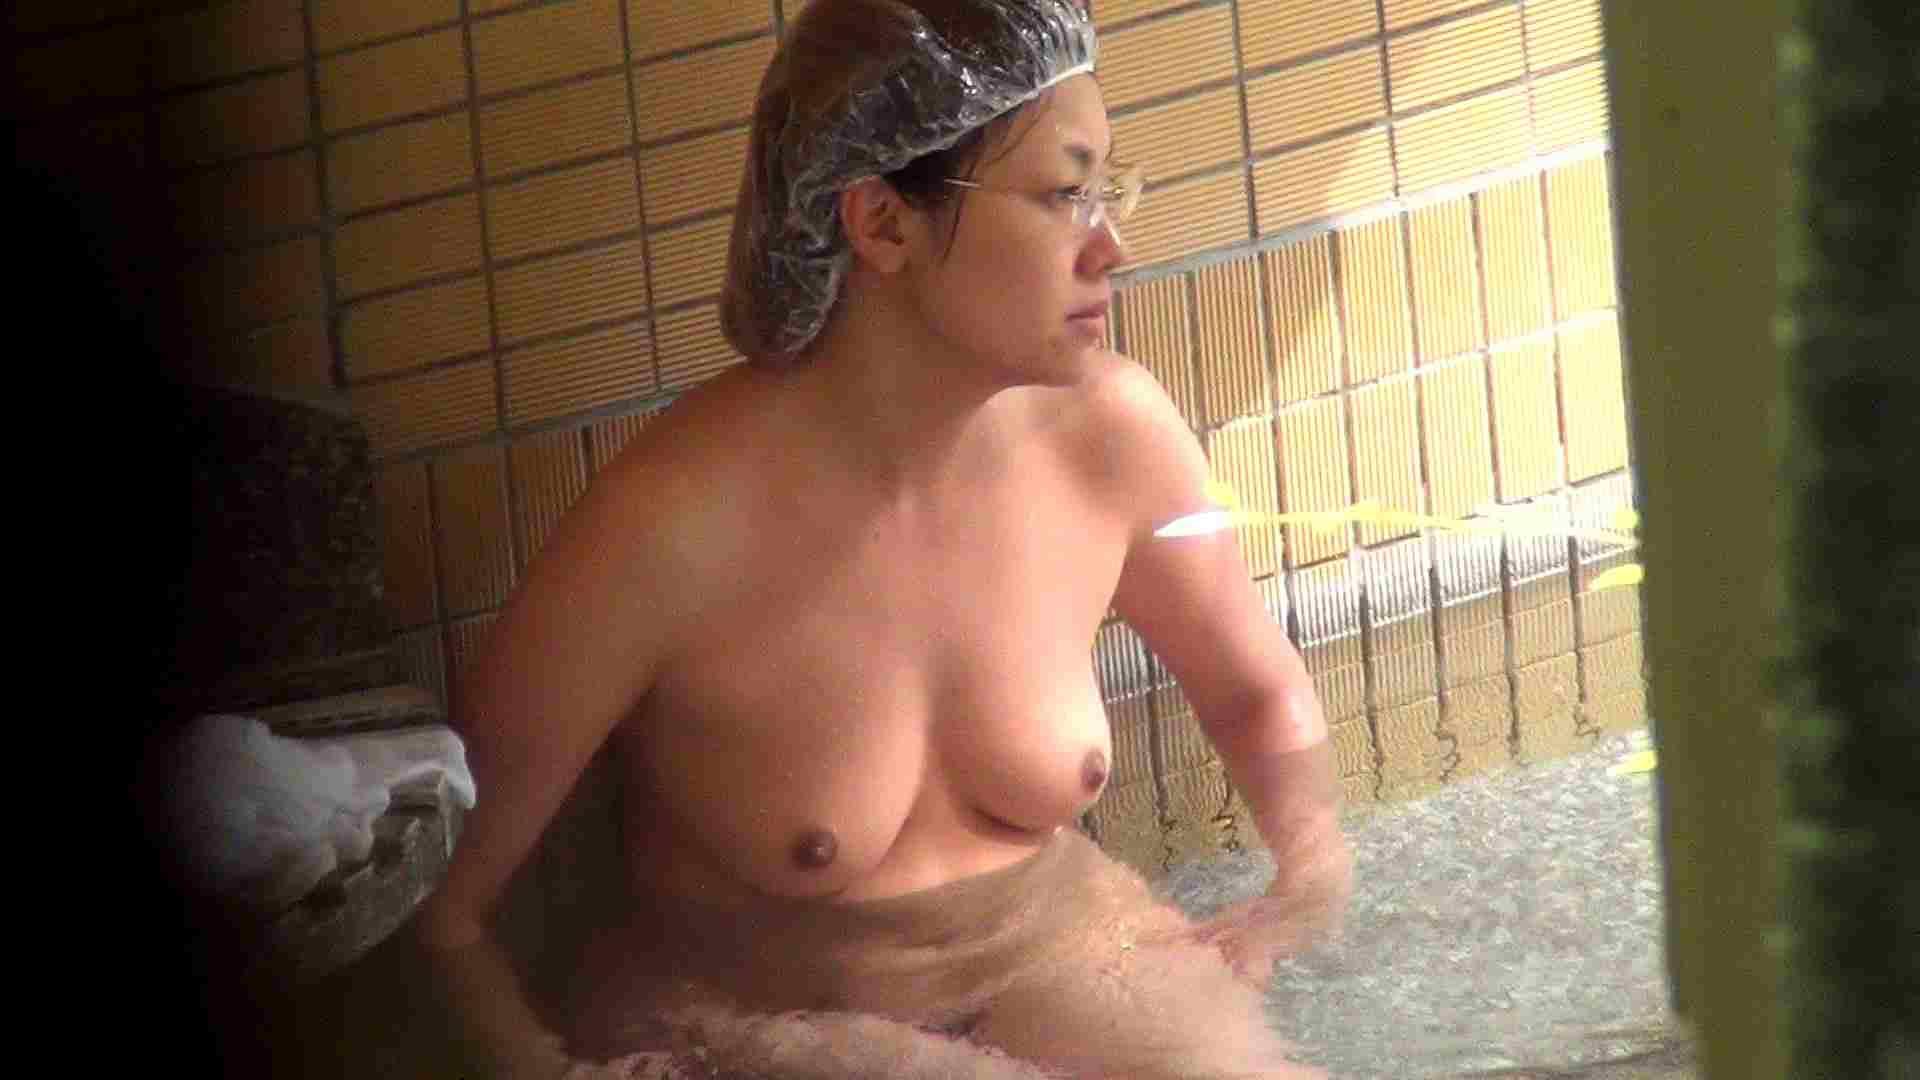 Aquaな露天風呂Vol.280 OLセックス | 盗撮  91画像 82